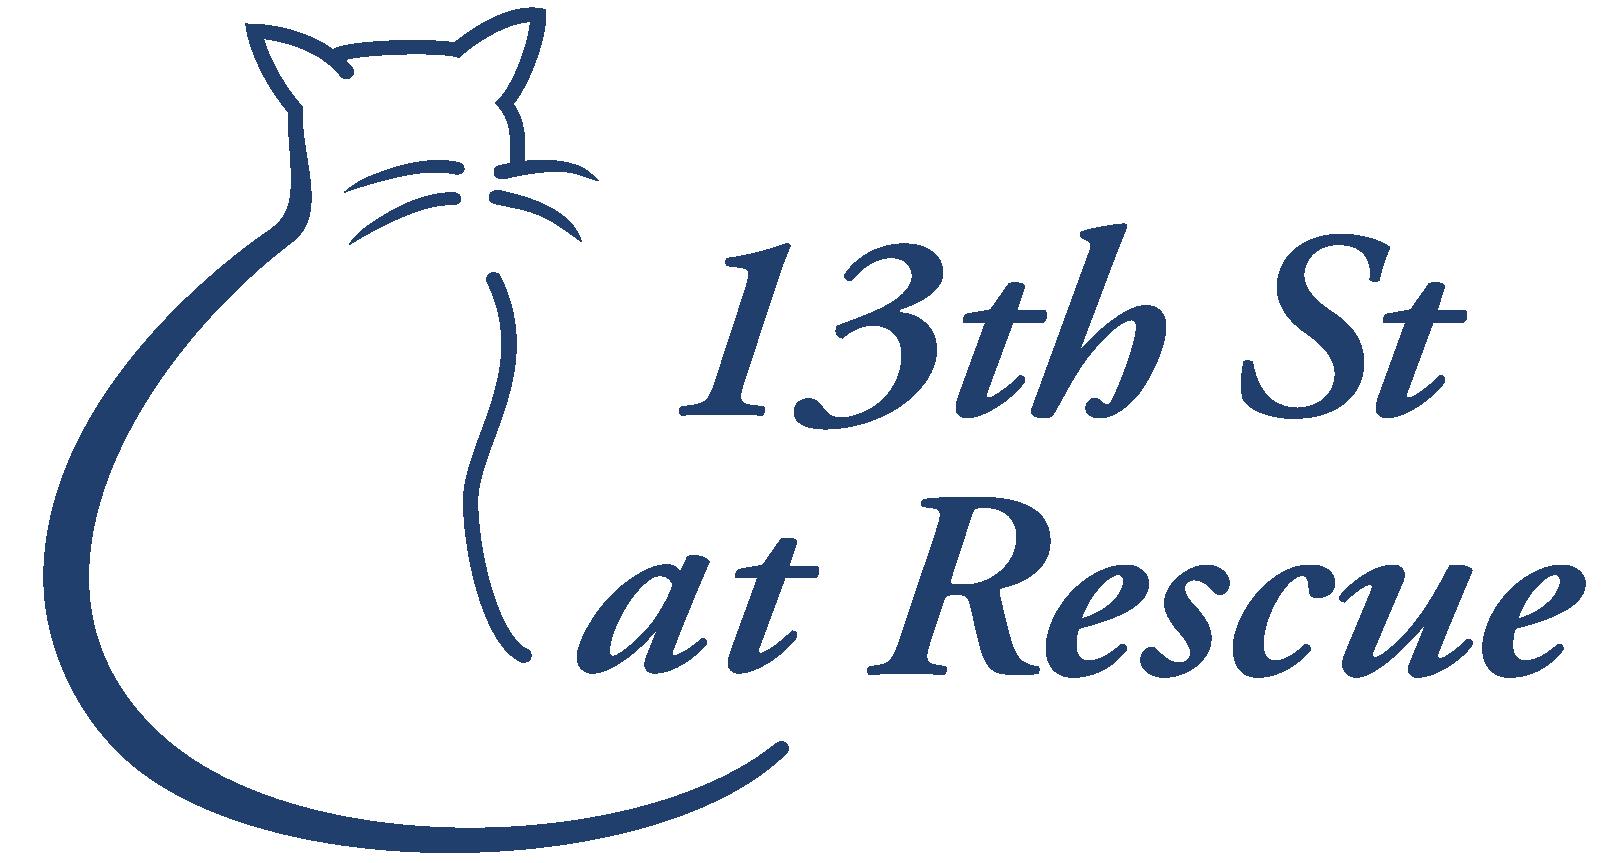 Thirteenth advisory committee ebay. Neighborhood clipart street address